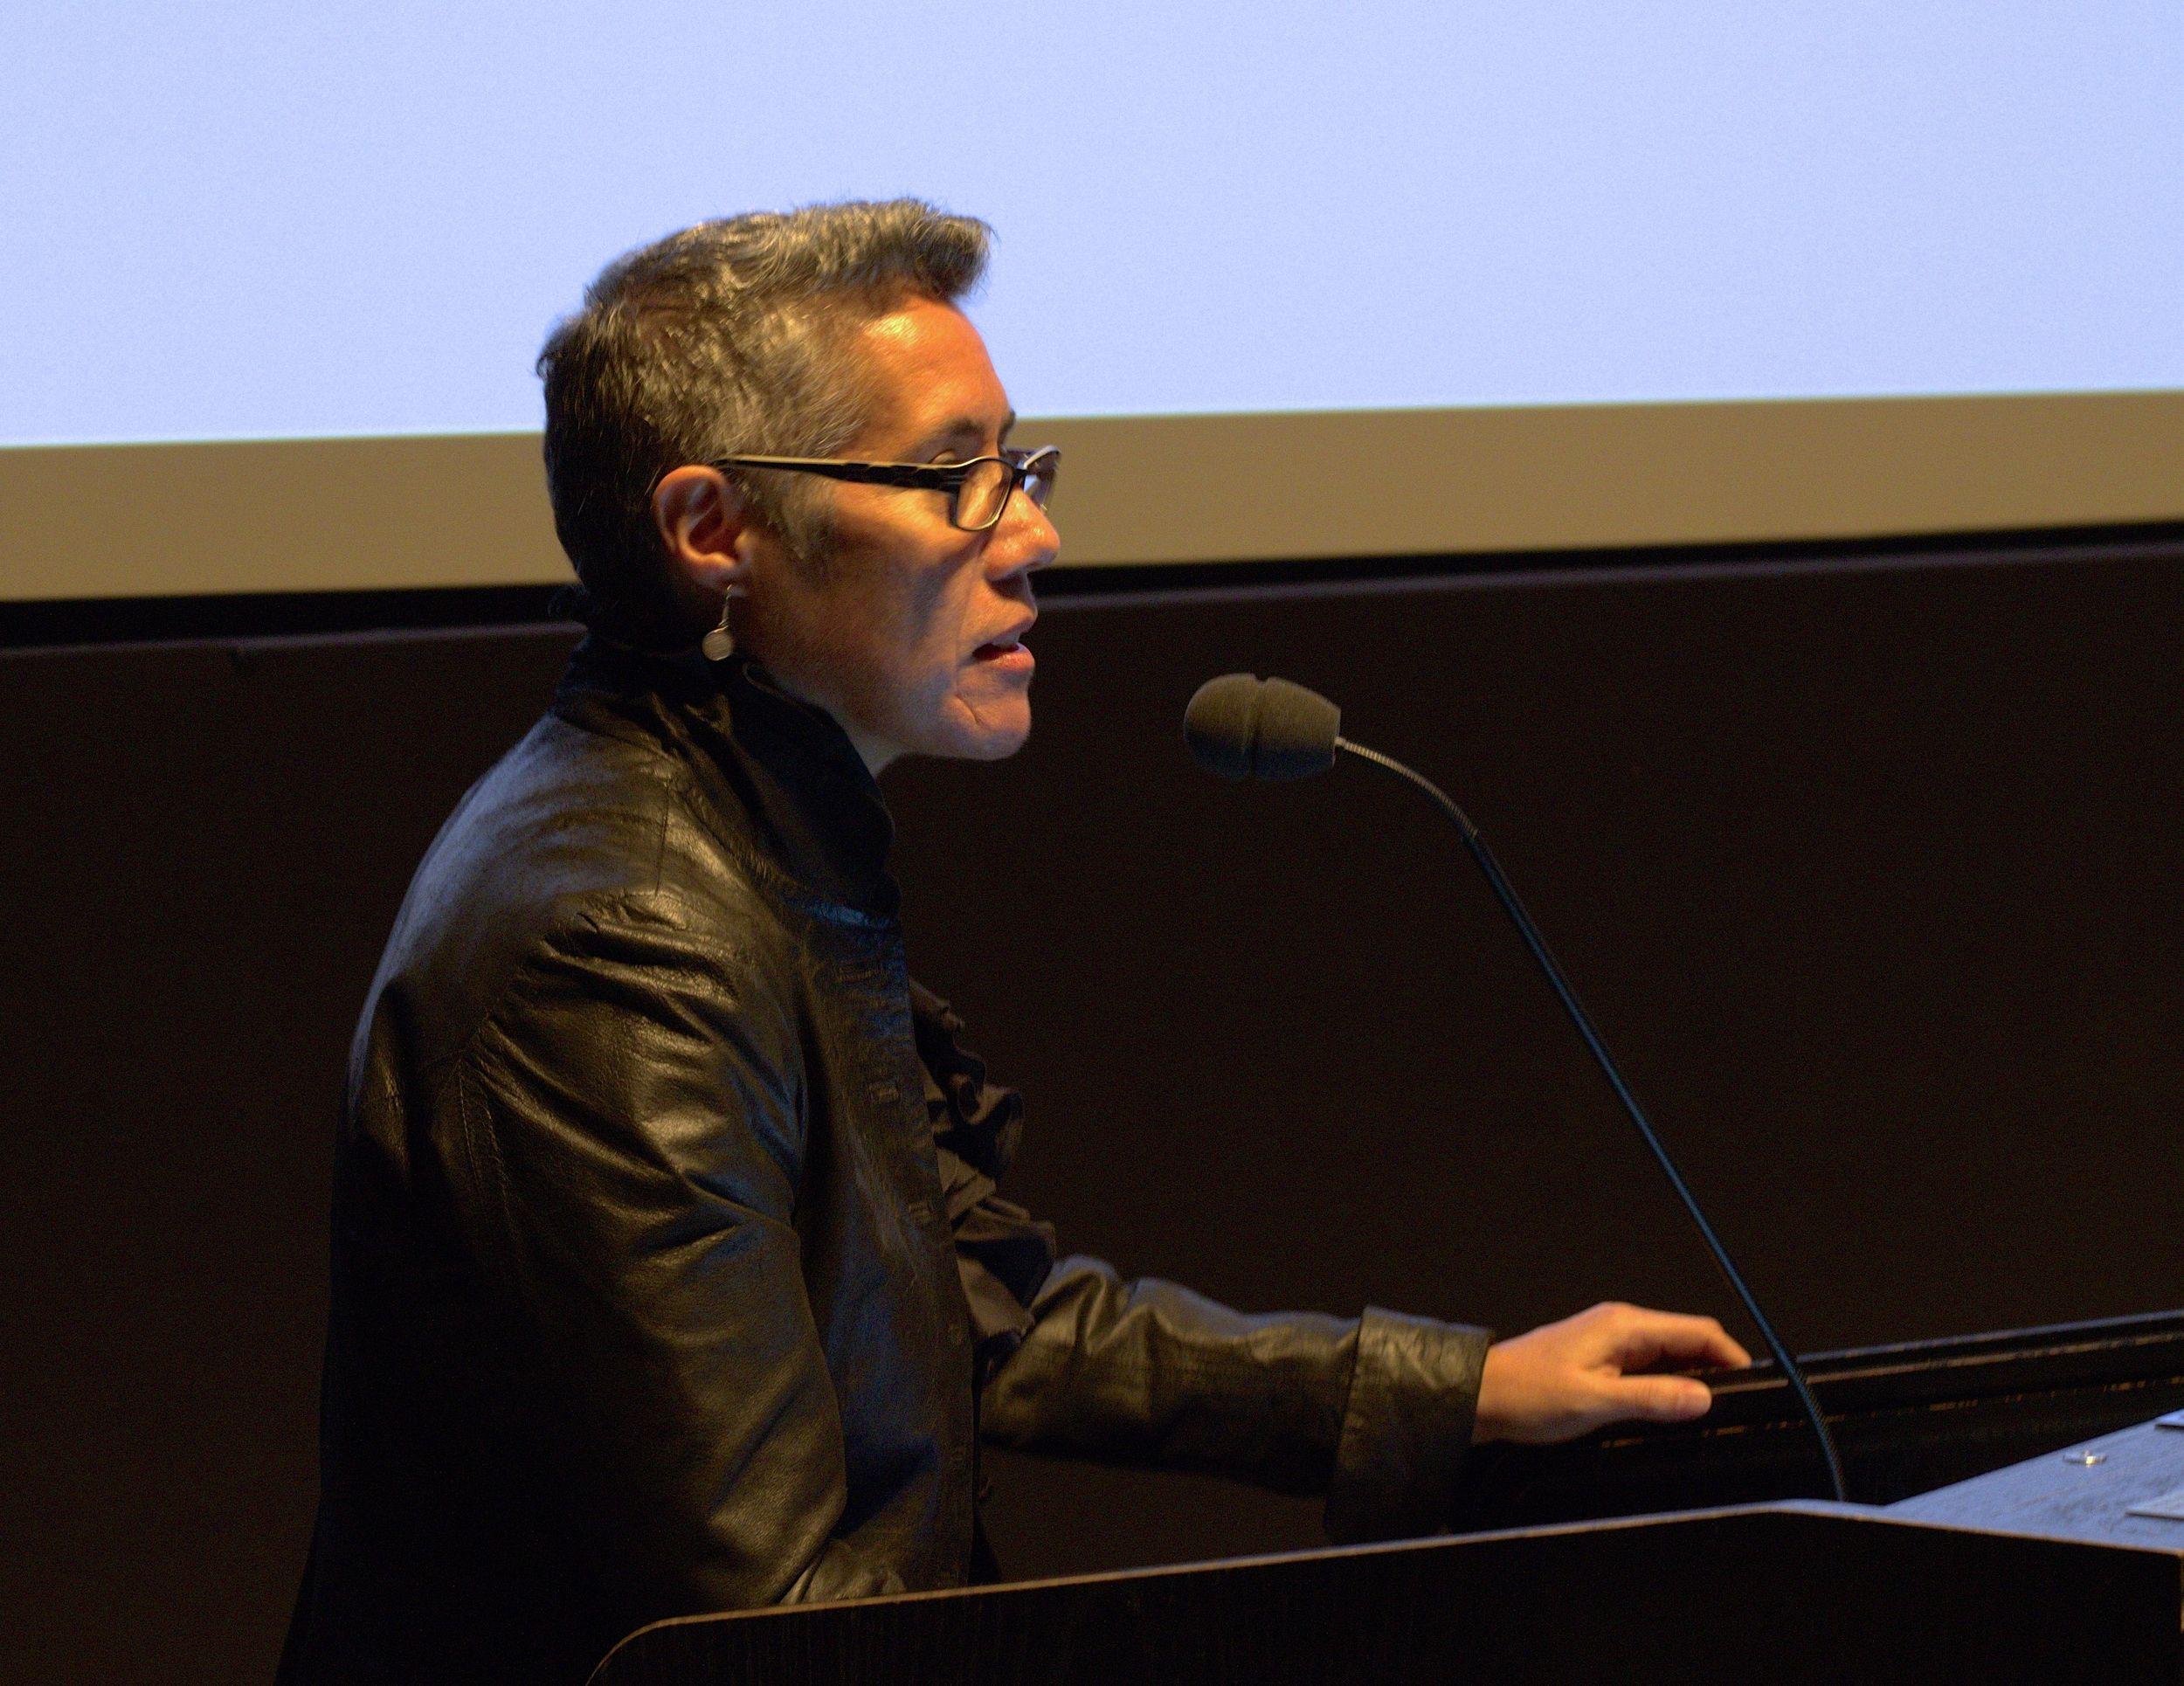 Summit Founder & Organizer, filmmaker and professor Cristina Kotz Crnejo